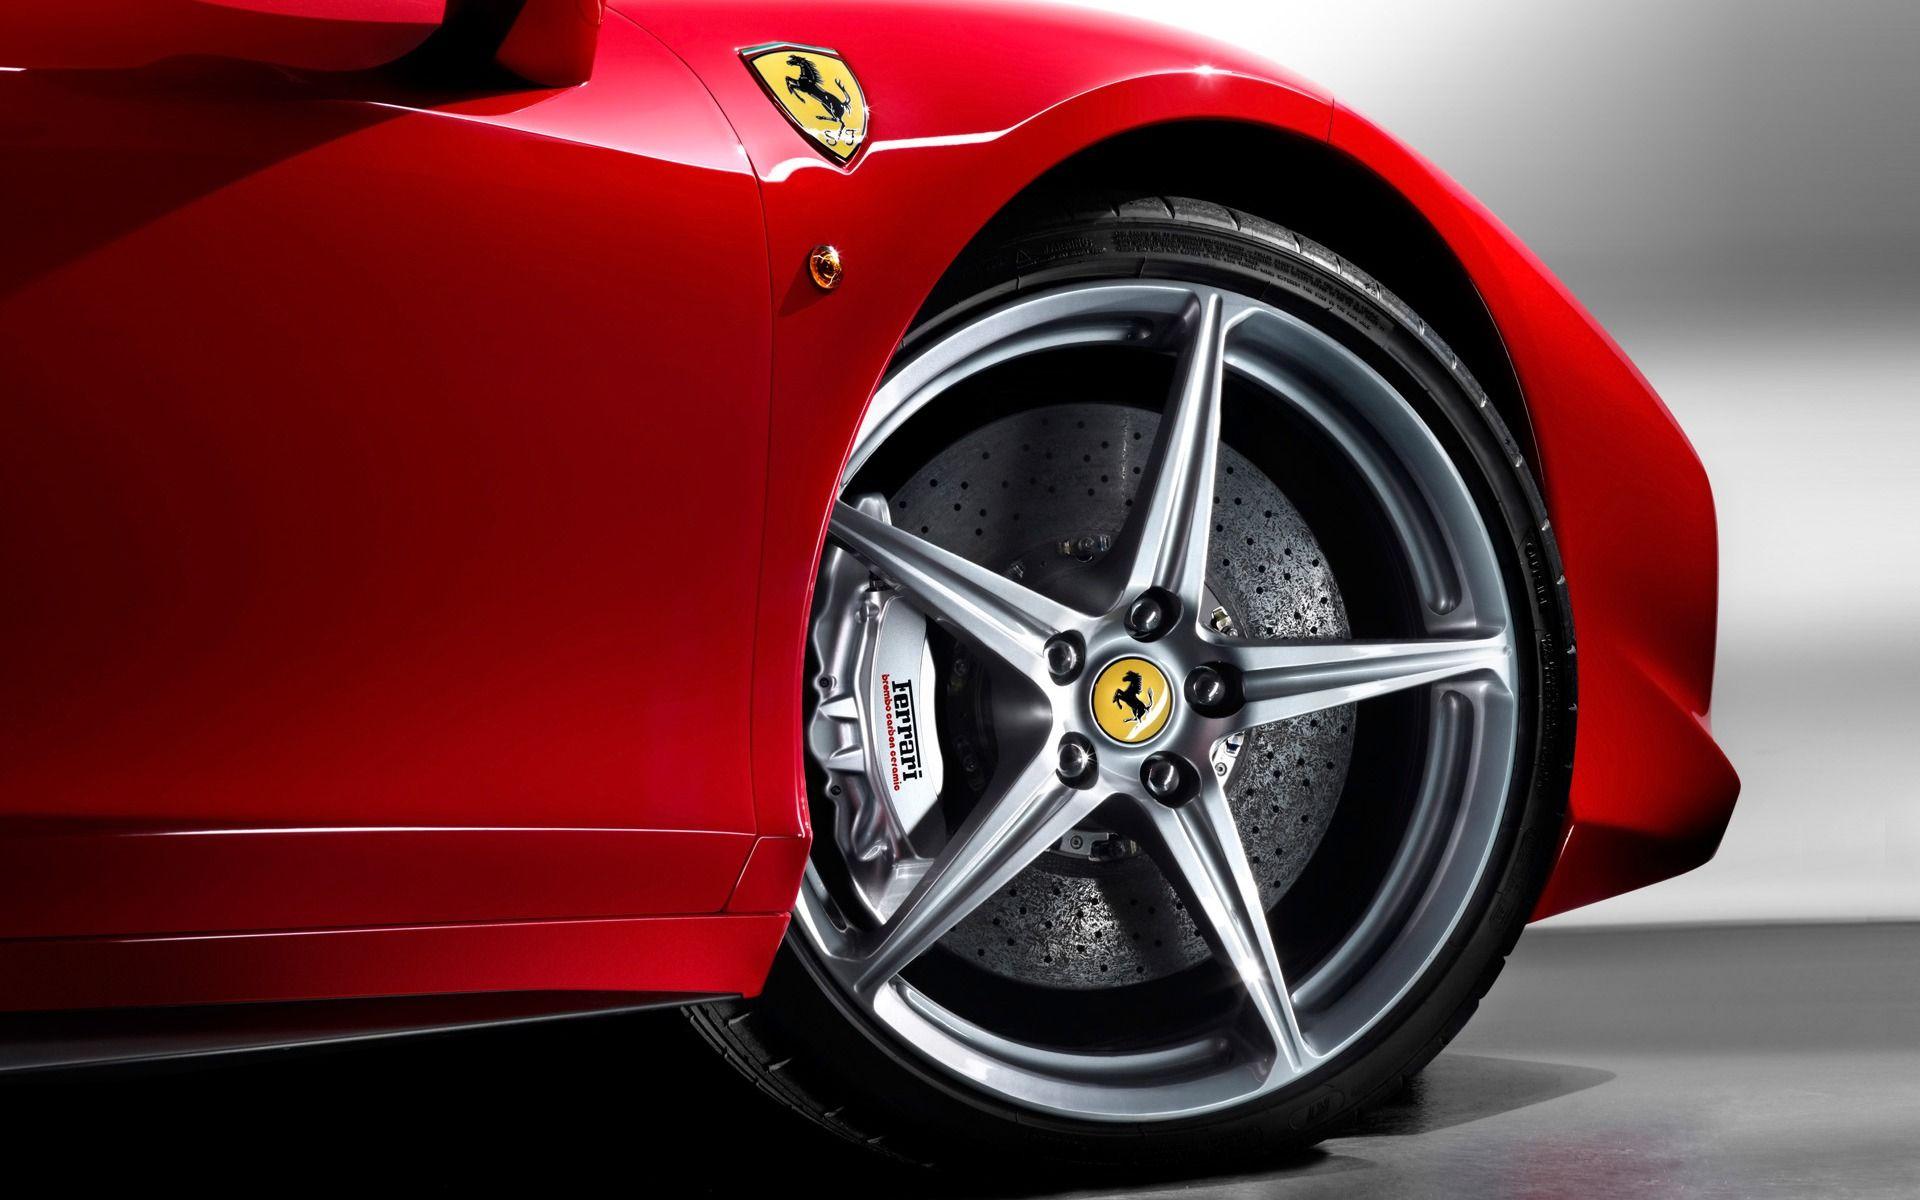 Ferrari Cars HD Wallpapers, Free Wallpaper Downloads, Ferrari 1920×1200  Imagenes De Ferrari Wallpapers (31 Wallpapers) | Adorable Wallpapers